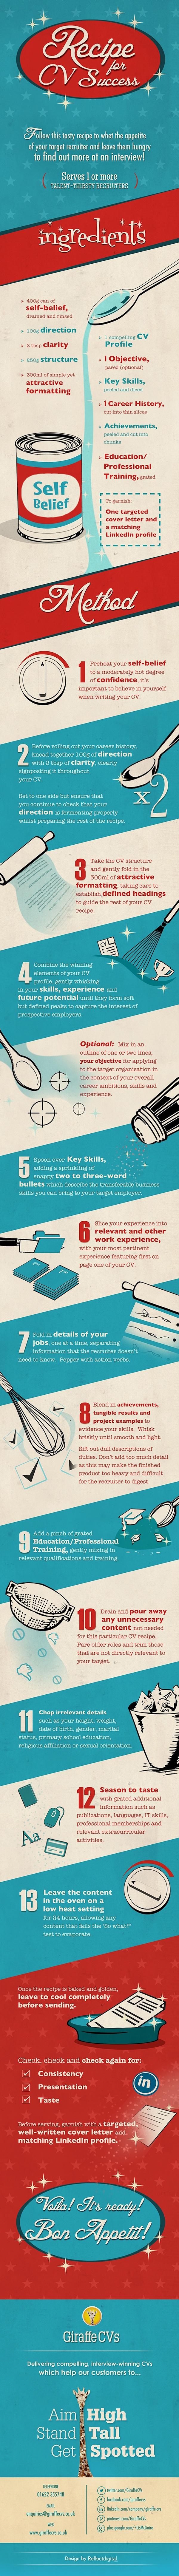 recipe for success copy.jpg